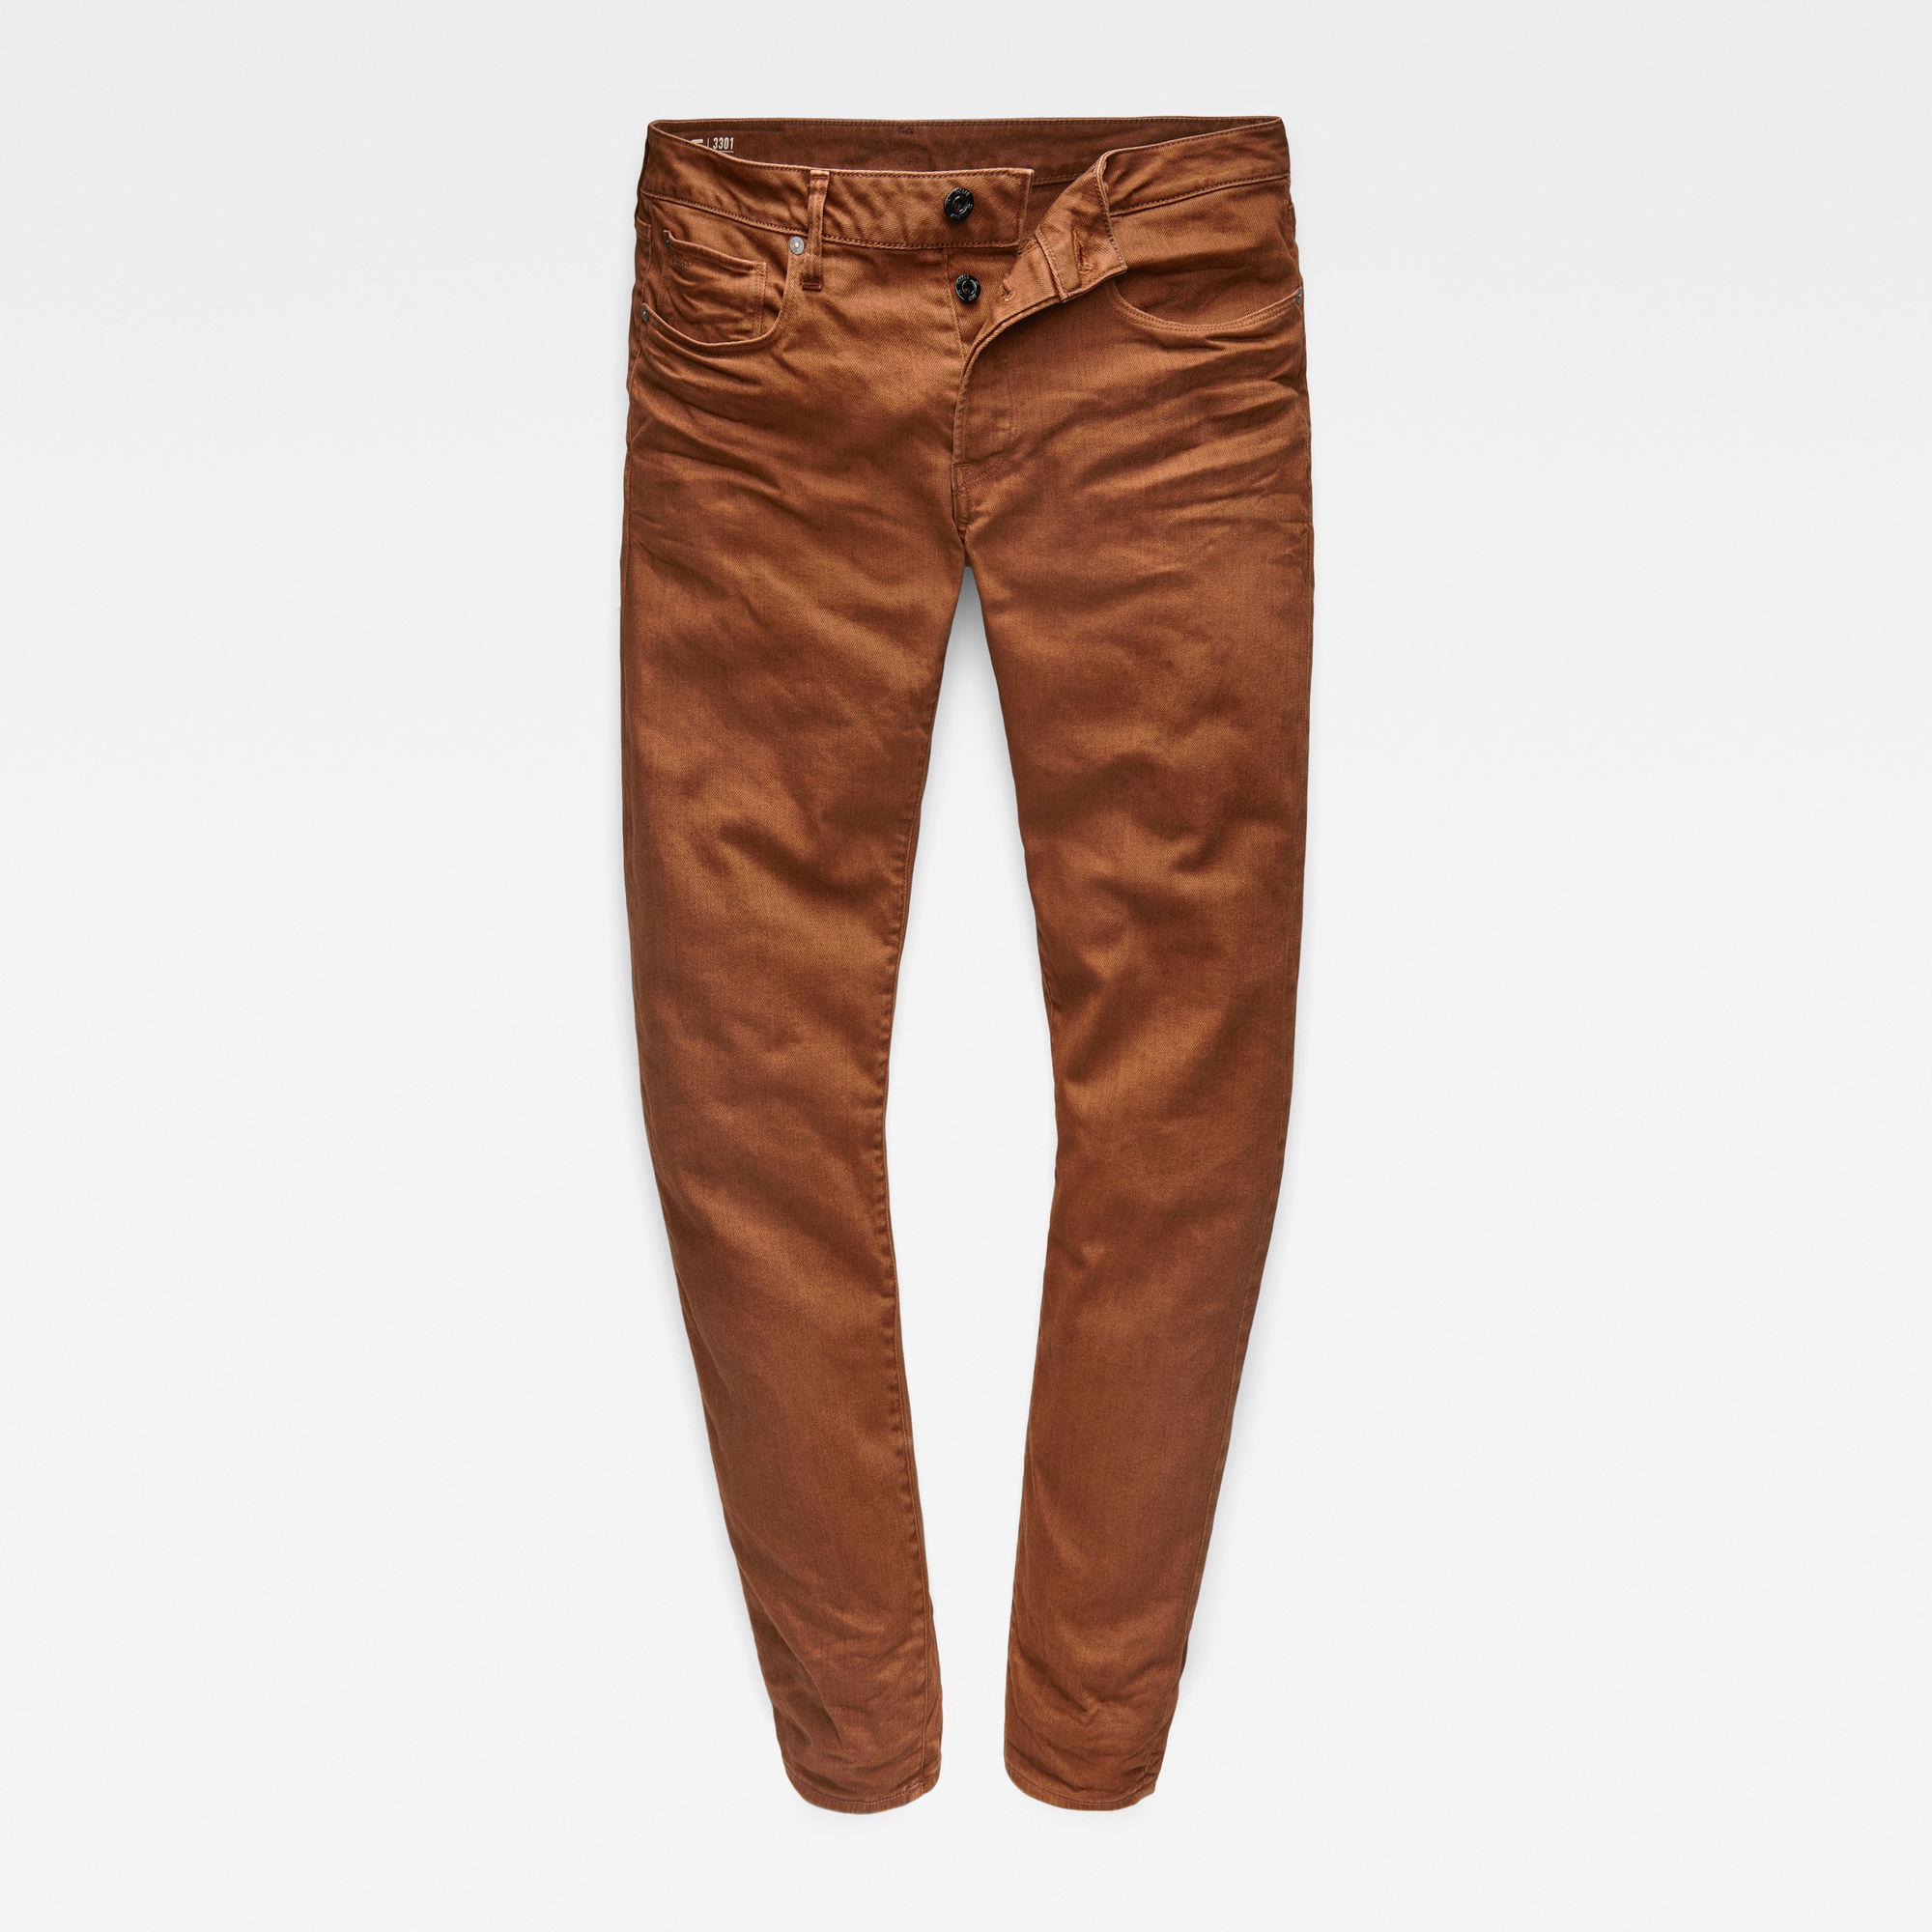 3301 Slim Color Jeans